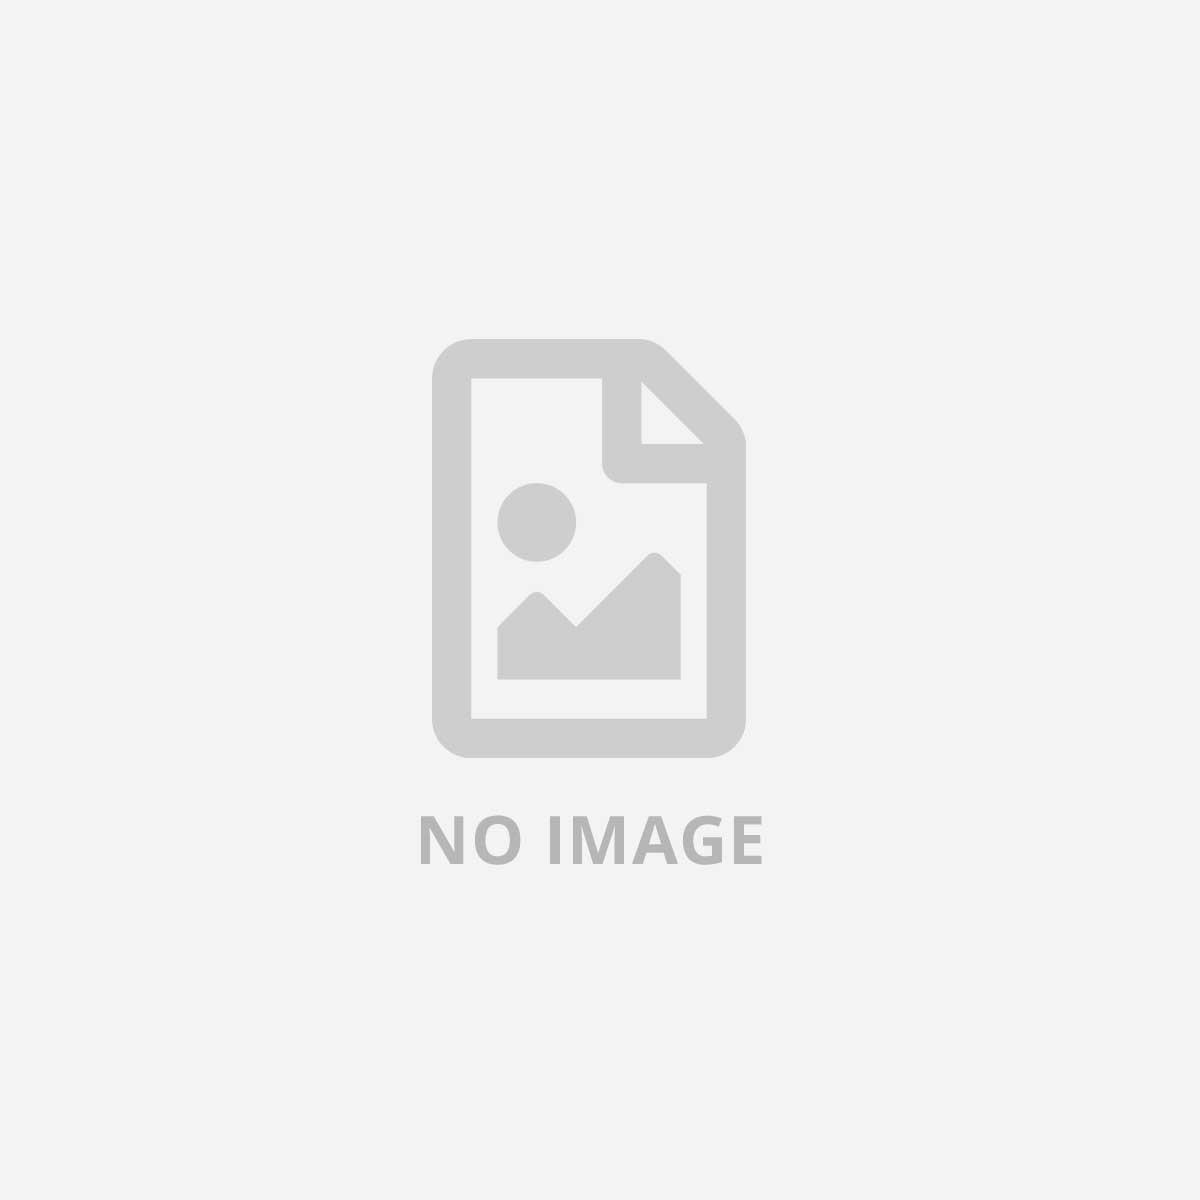 ELECTRONIC ARTS XONE NBA LIVE 18:THE ONE EDITION